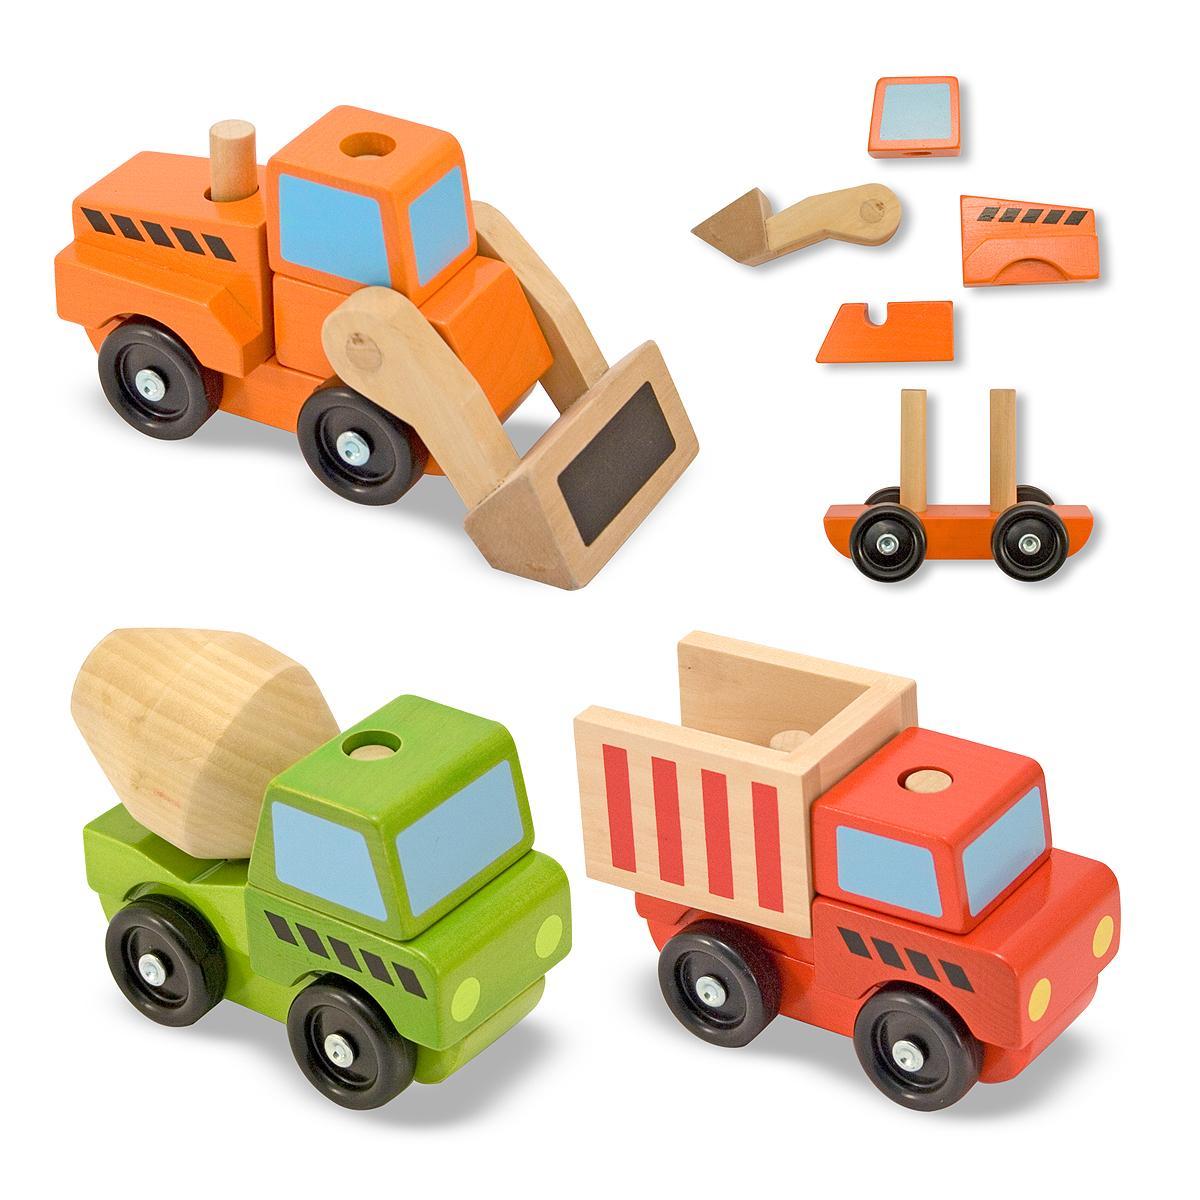 Wood Building Toys For Boys : Amazon melissa doug stacking construction vehicles